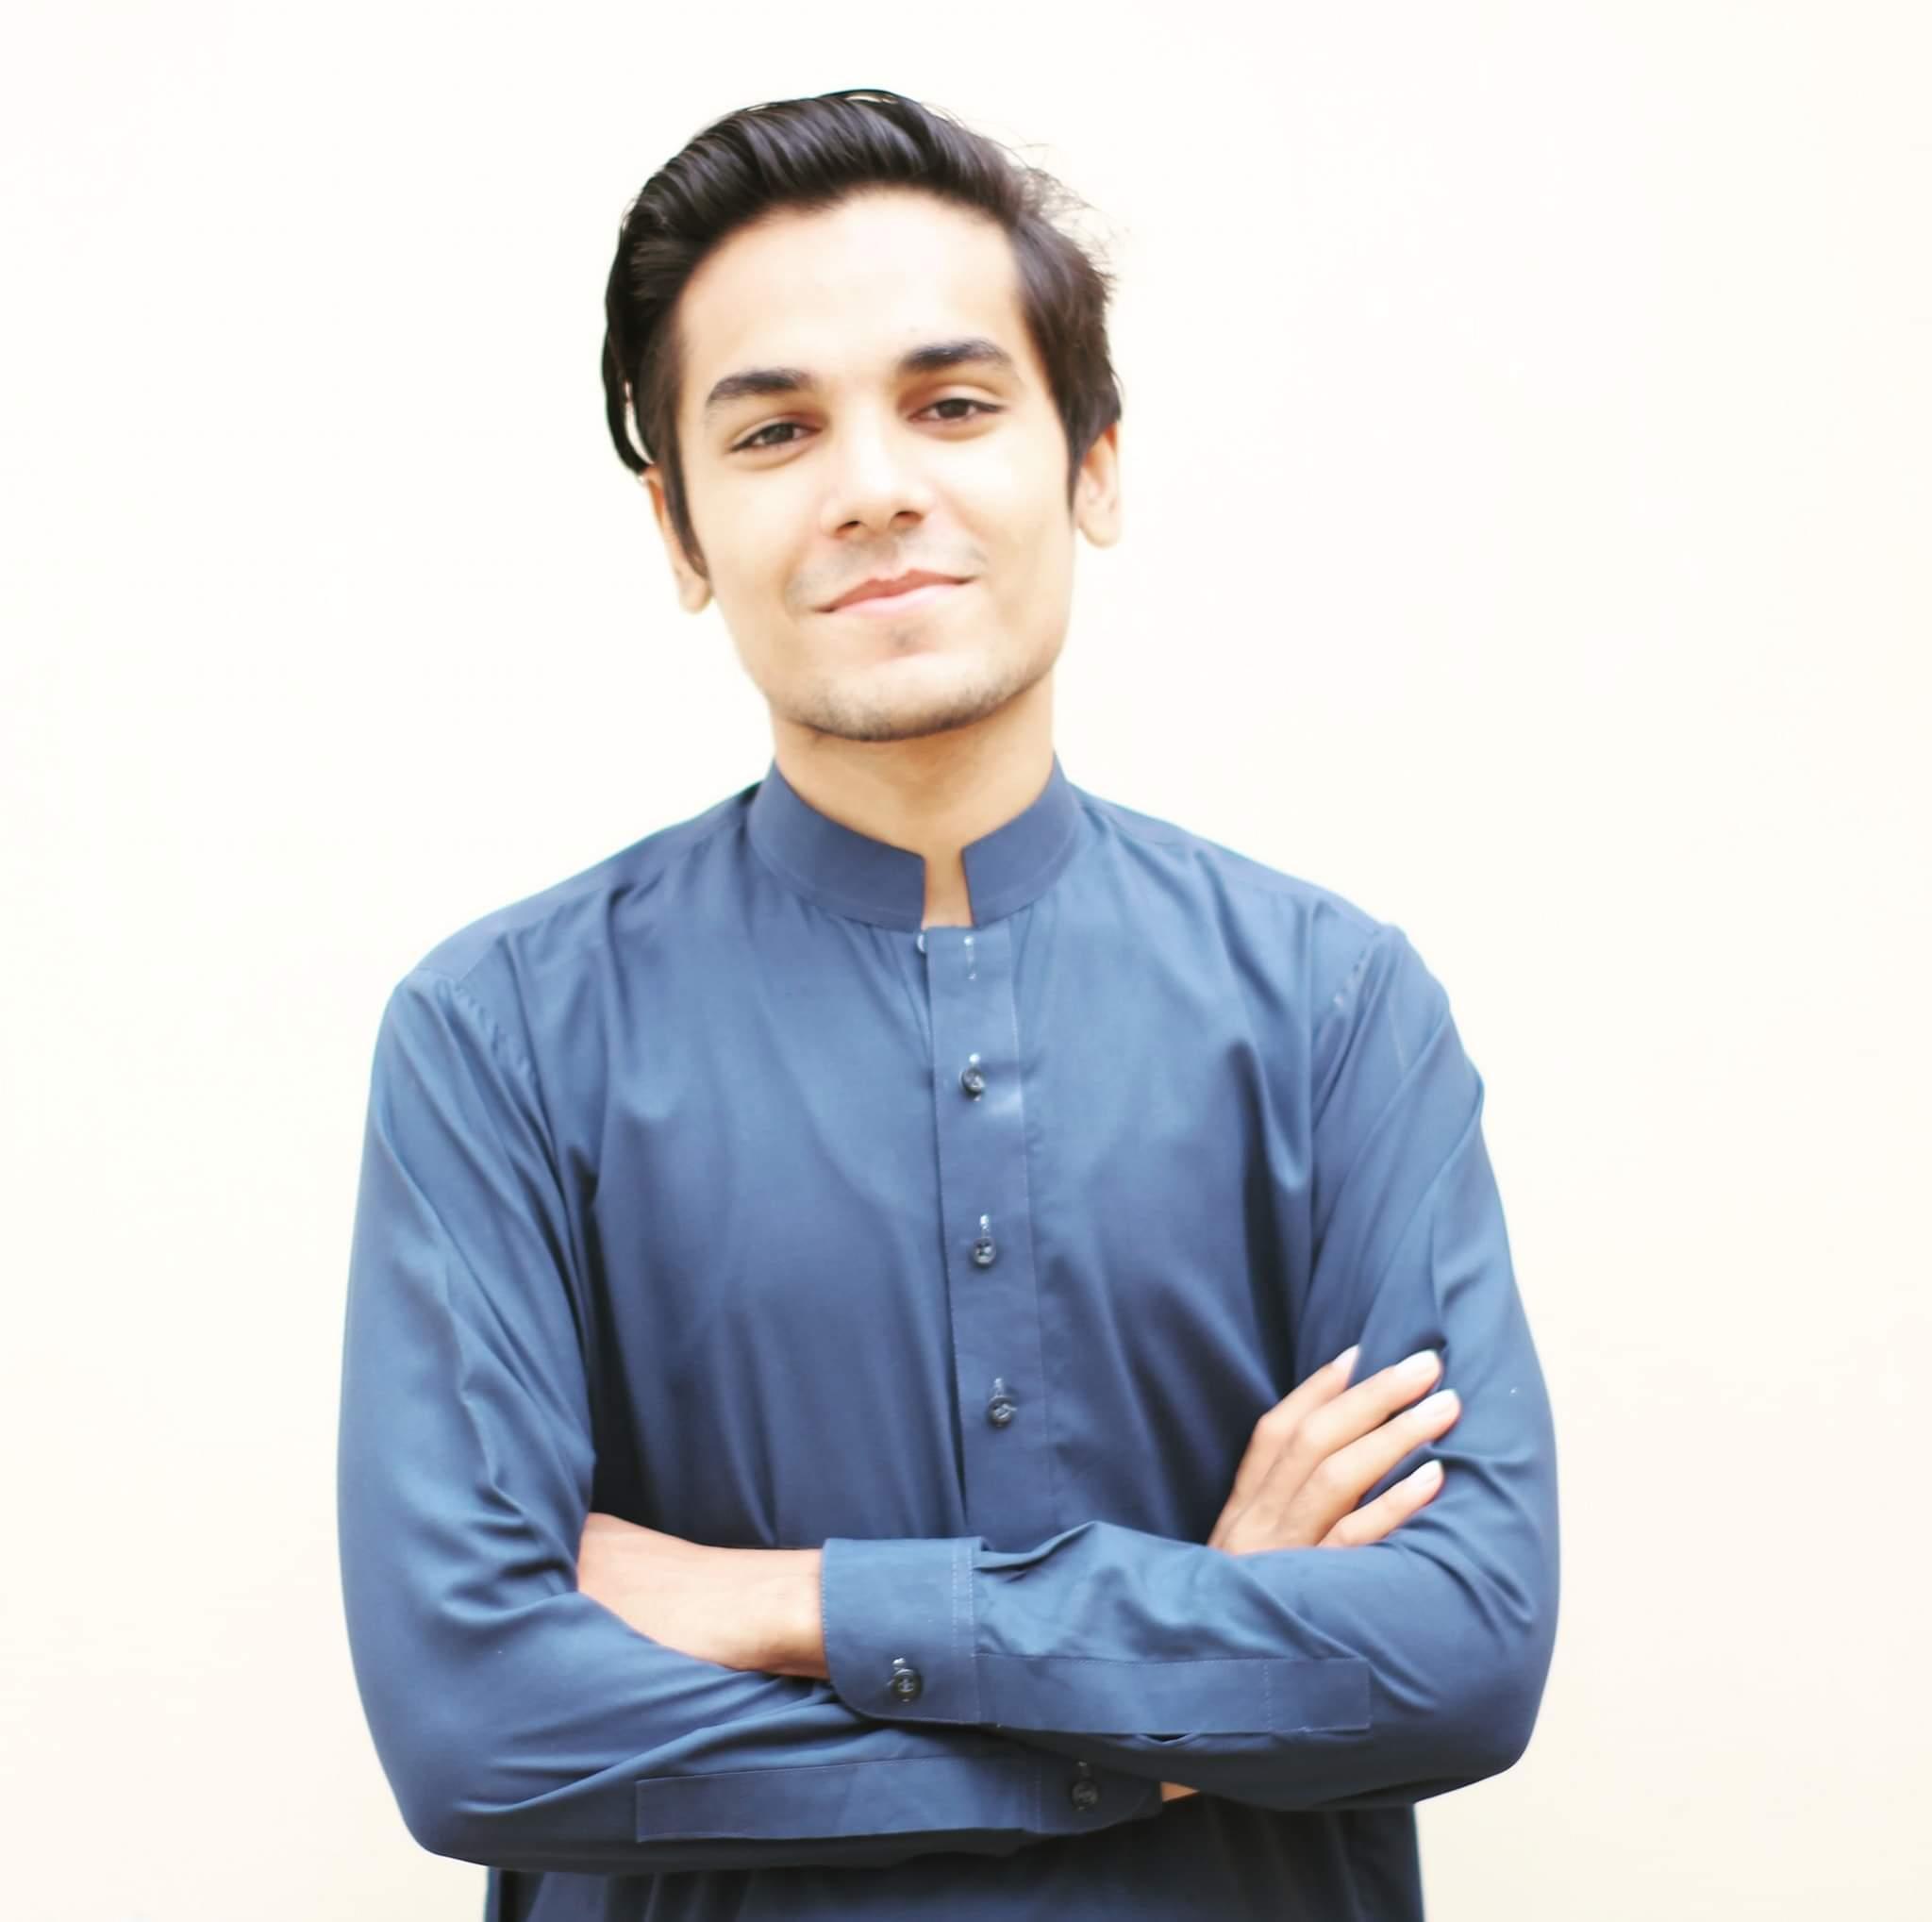 Muhammad Hassan Nasir